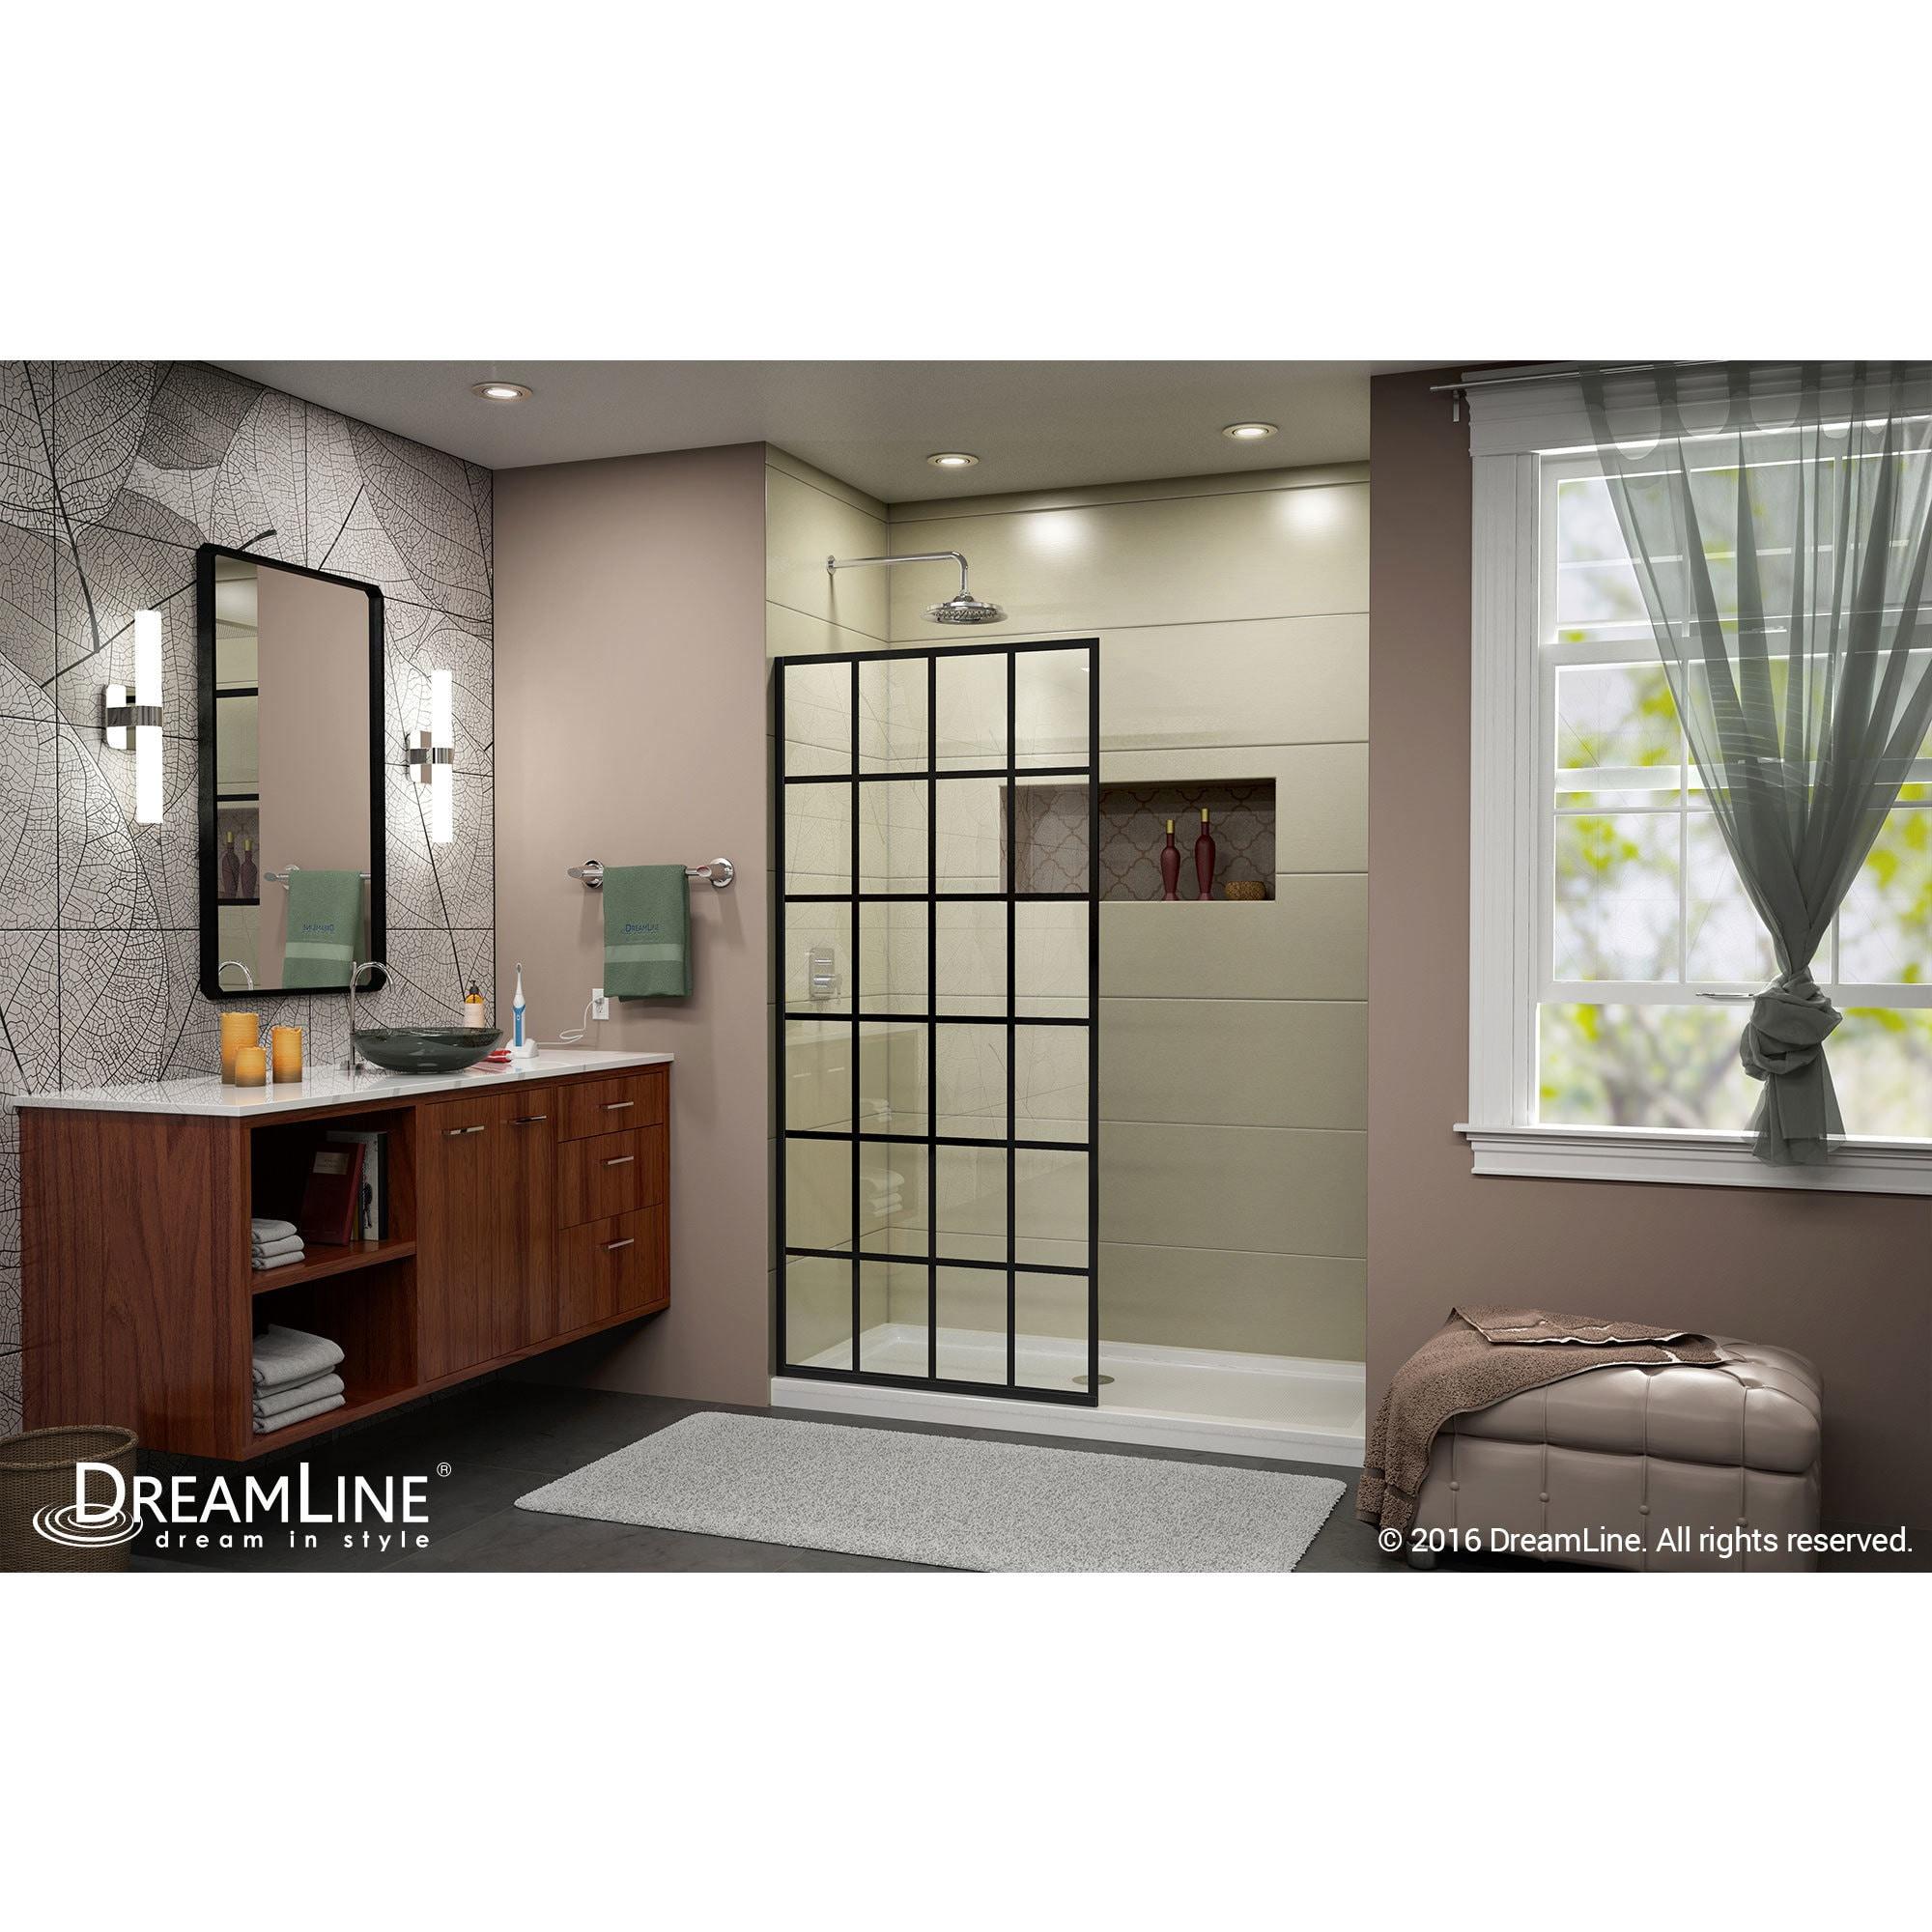 Shop Dreamline French Linea Toulon 34 In W X 72 In H Single Panel